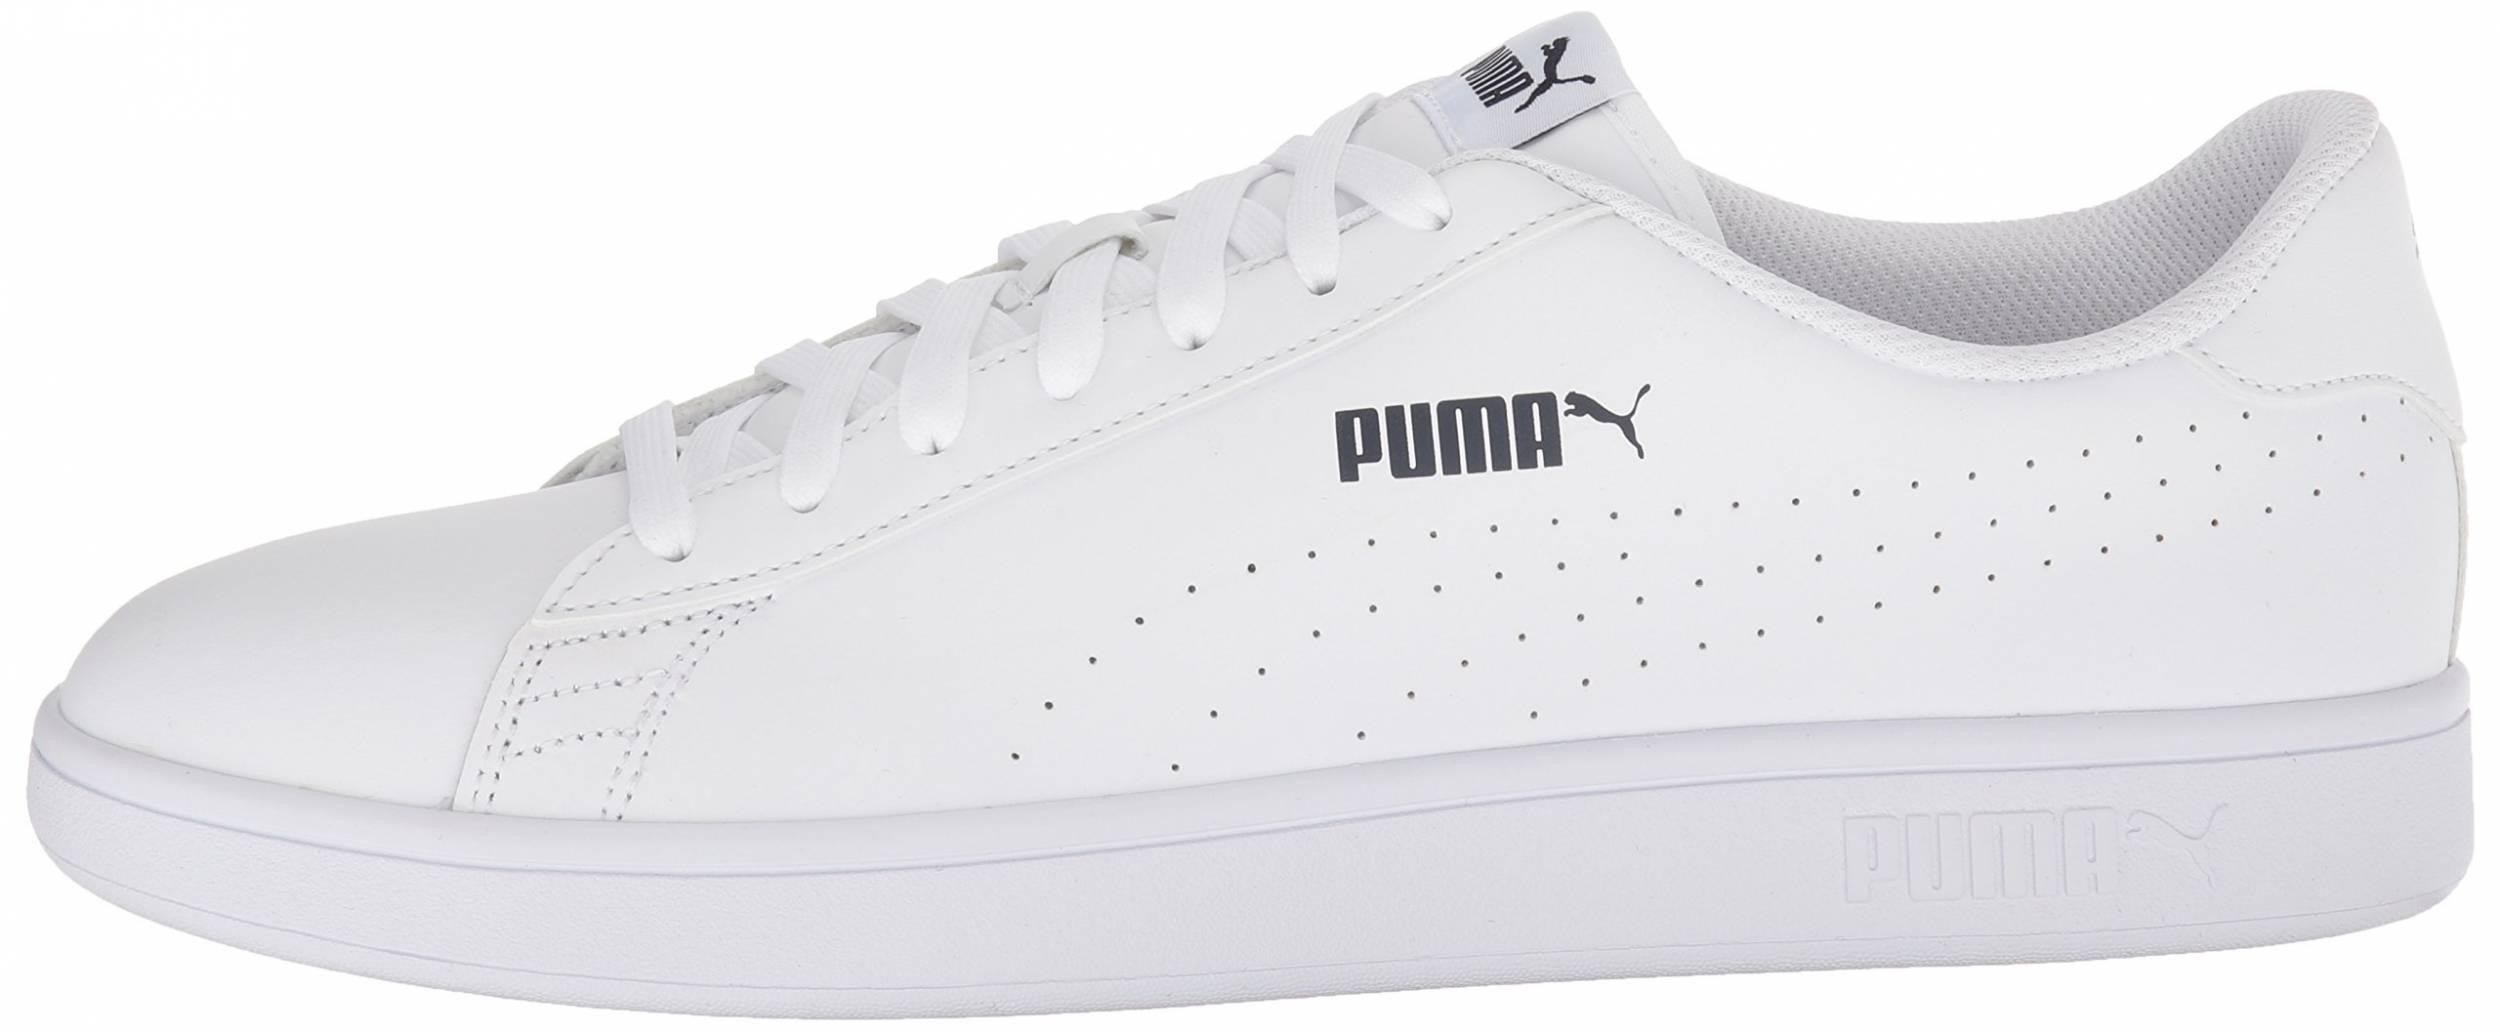 Puma Smash v2 L Perf sneakers in black orange (only $50) | RunRepeat